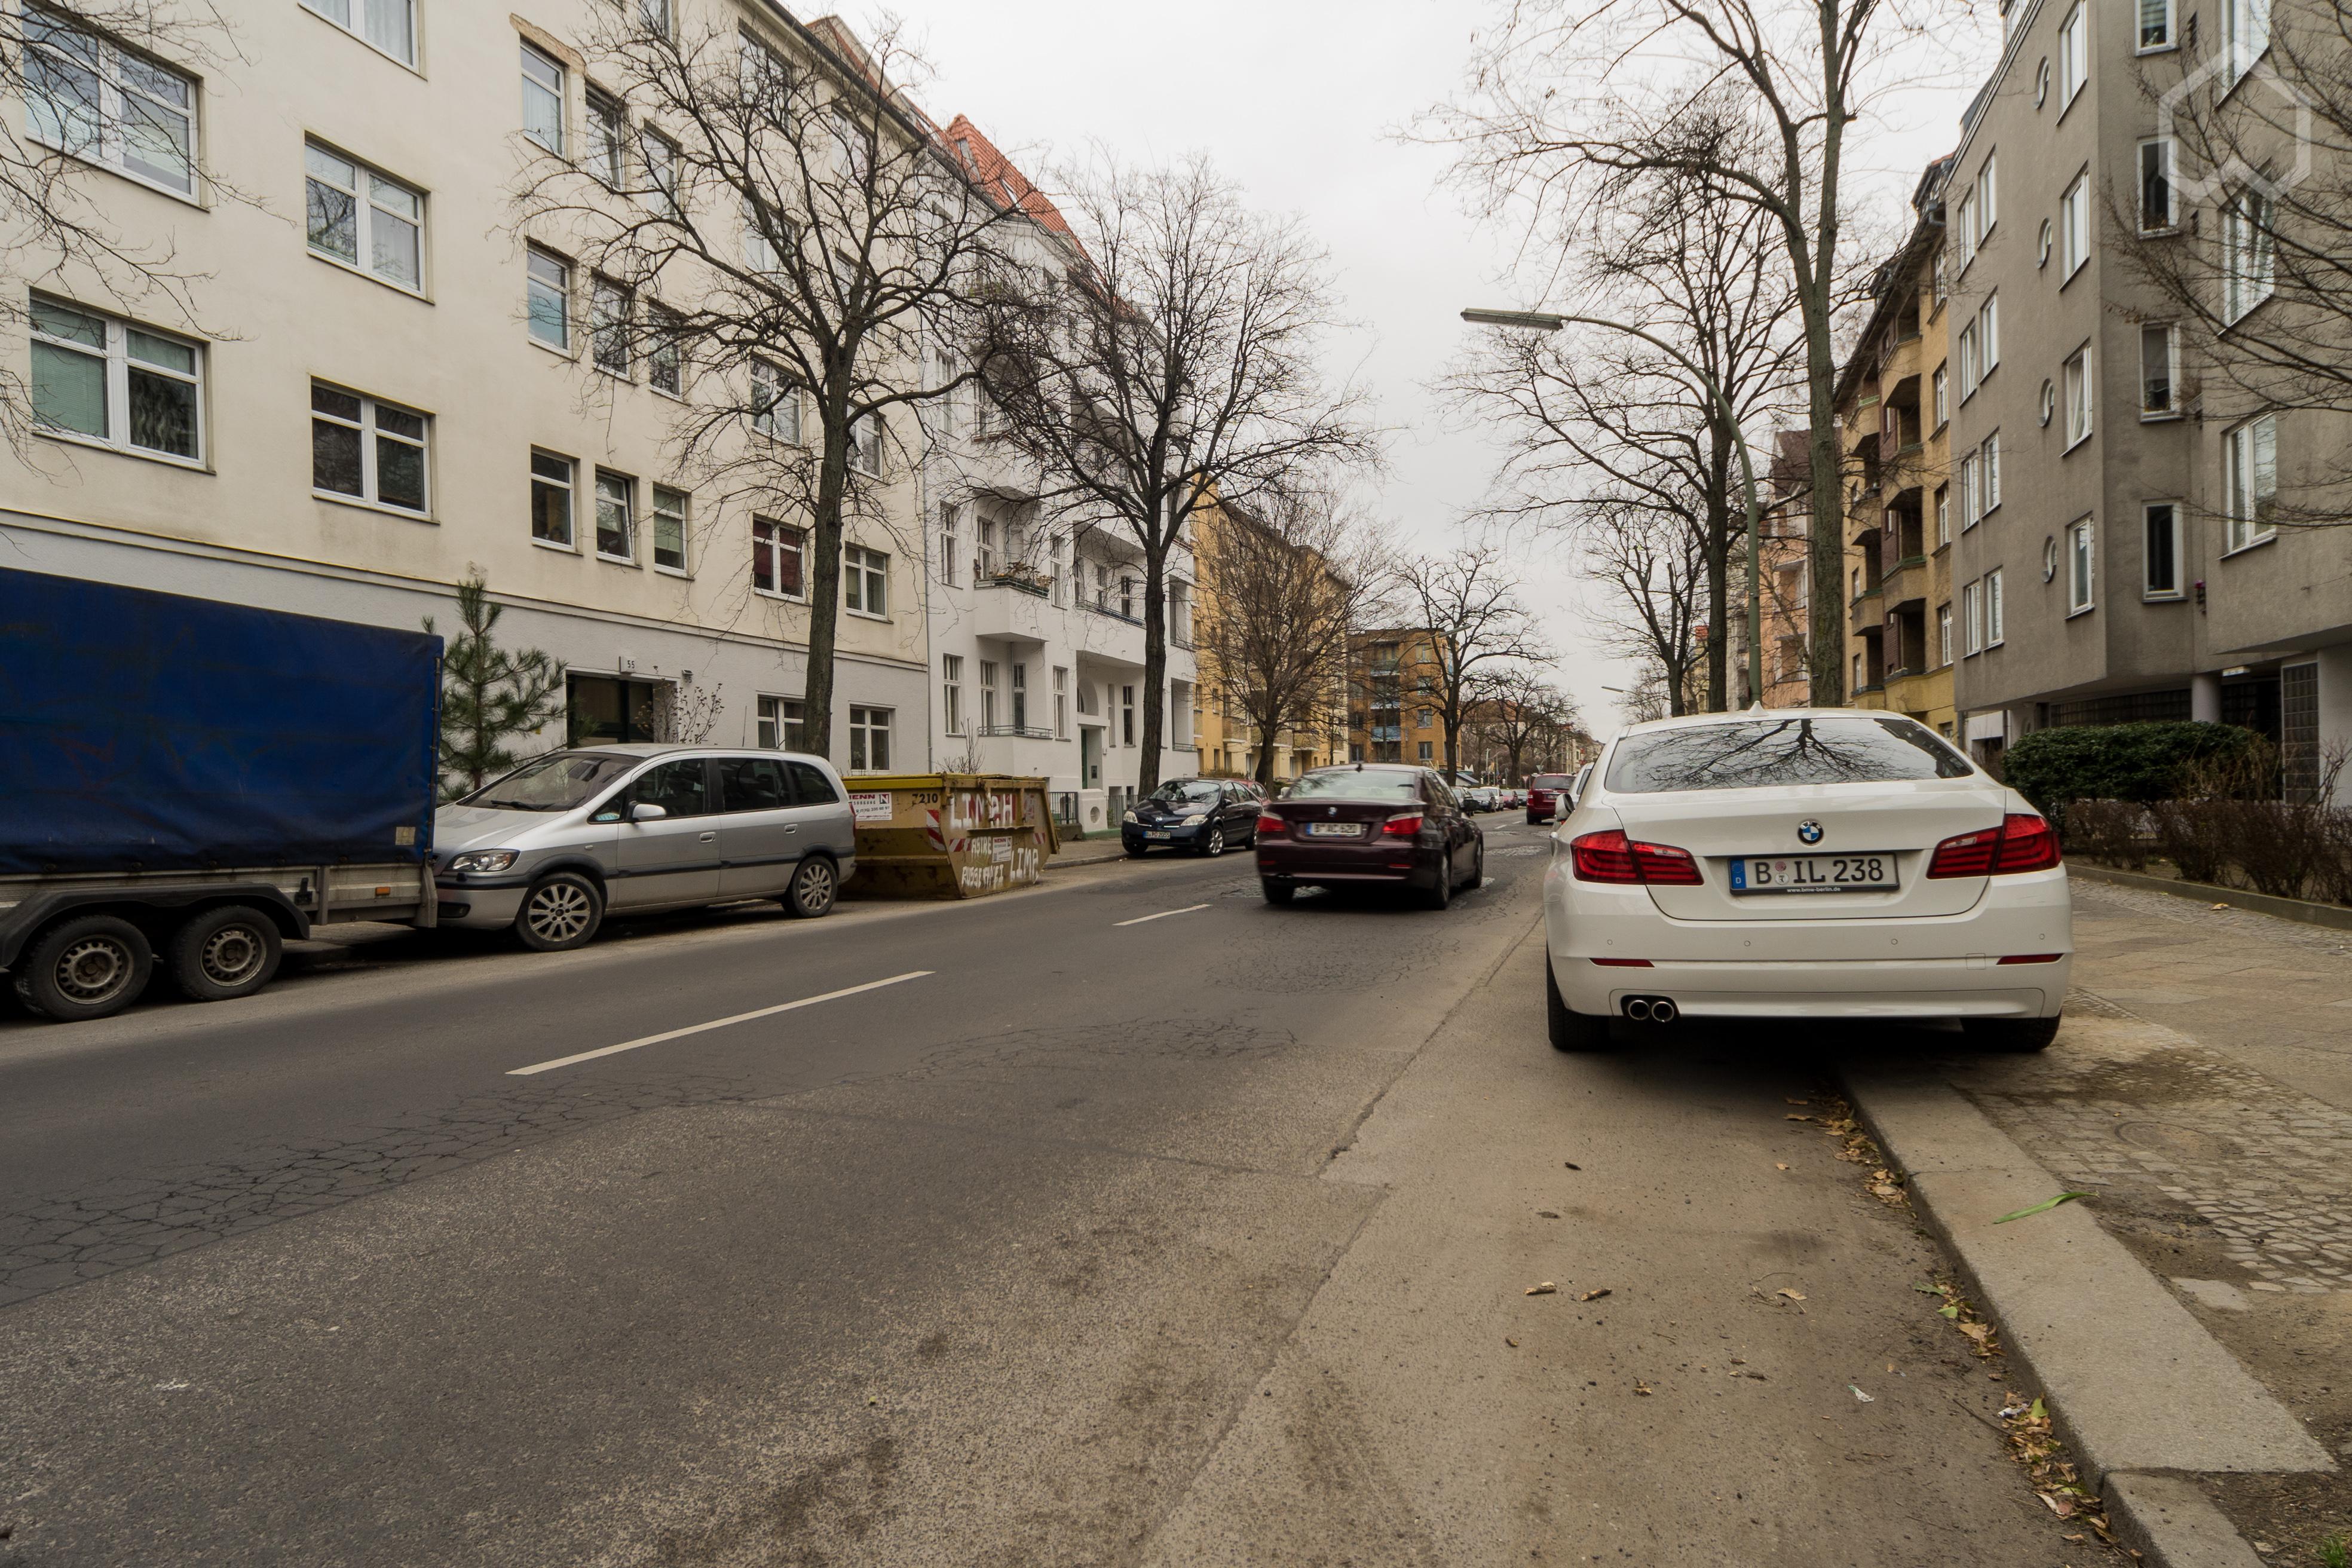 Feuerbachstraße